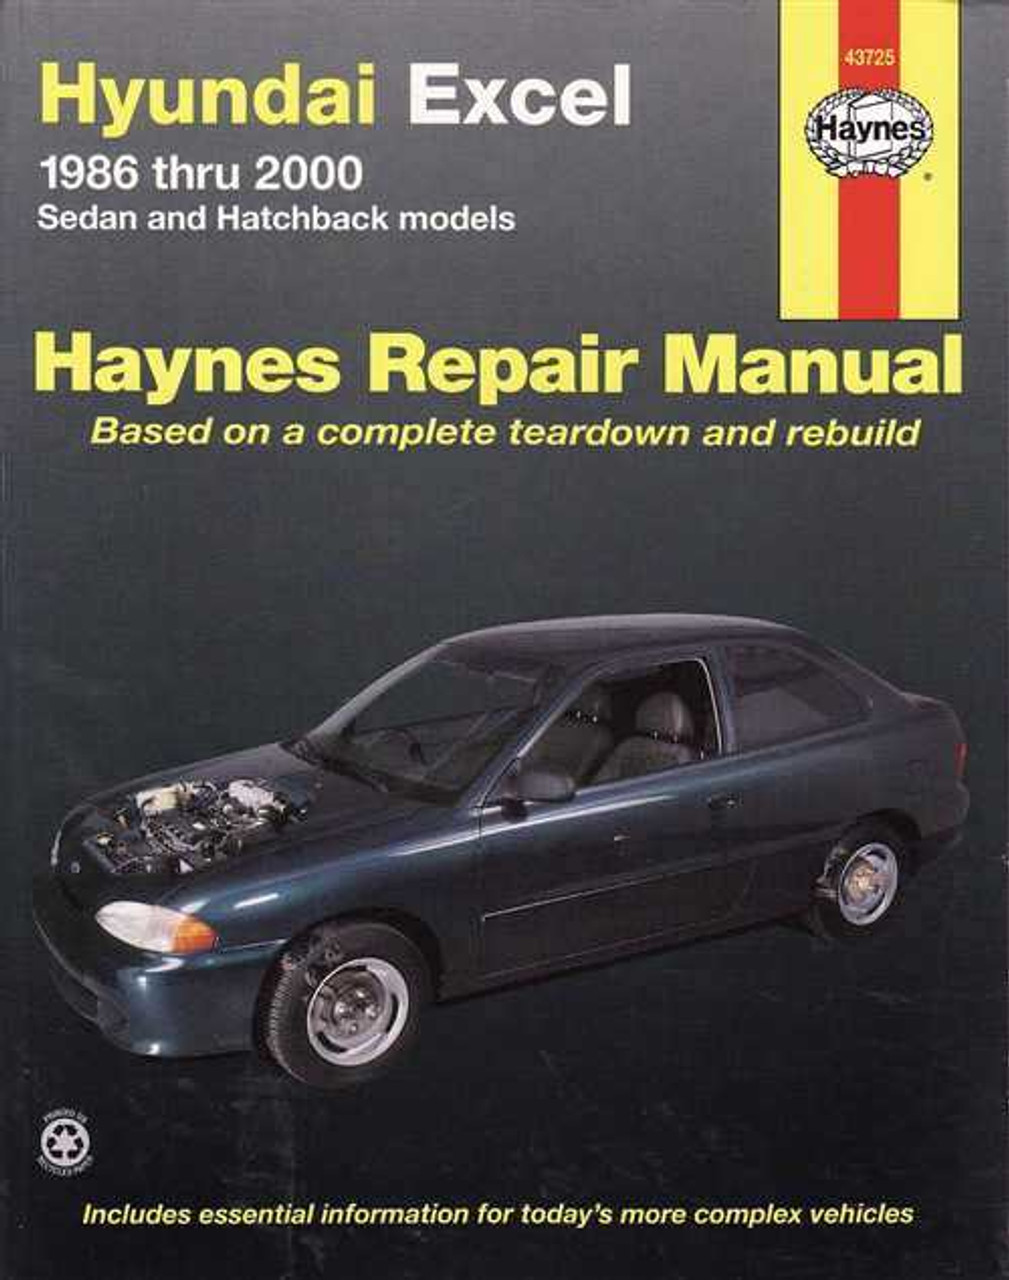 hyundai excel 1986 2000 workshop manual rh automotobookshop com au 2000 hyundai accent manual 5th gear pops out 2000 hyundai accent manual transmission fluid